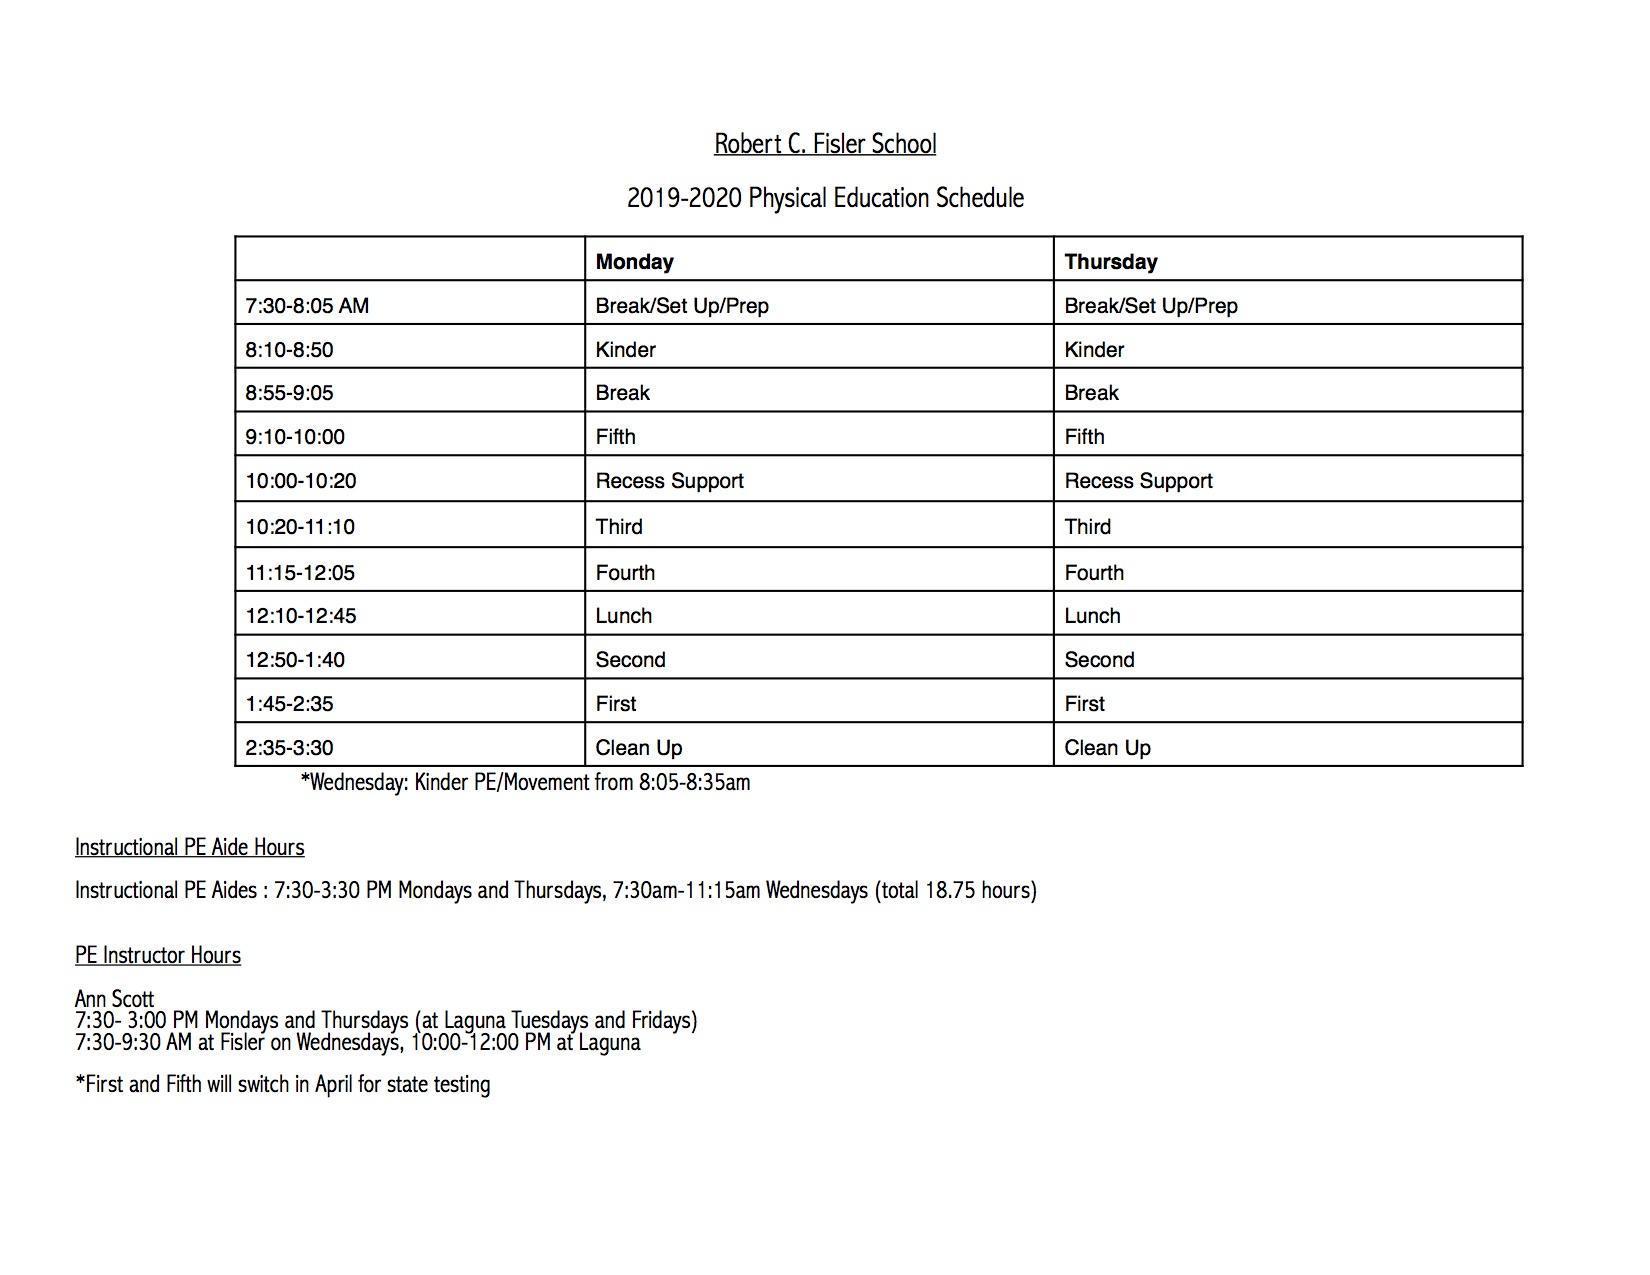 K-5 PE Schedule